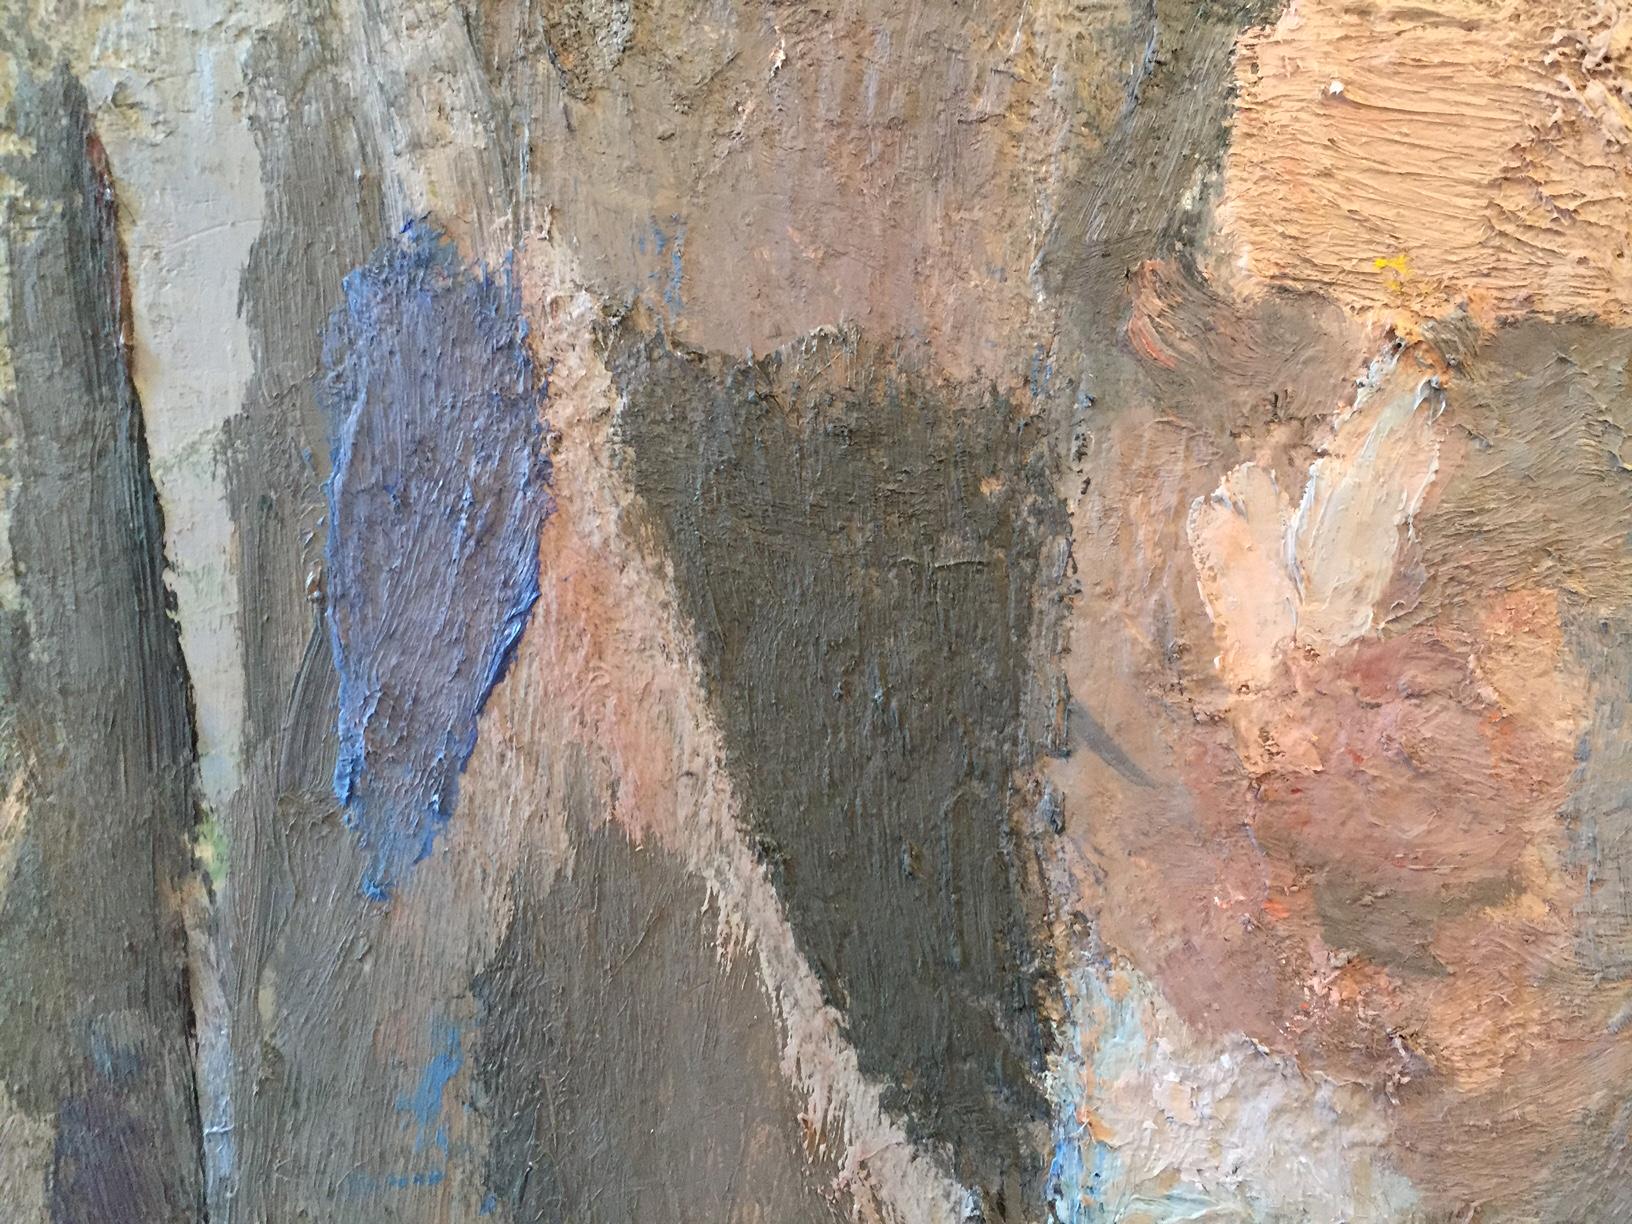 John-Dubrow-PrinceAndBroadway-detail1.JPG